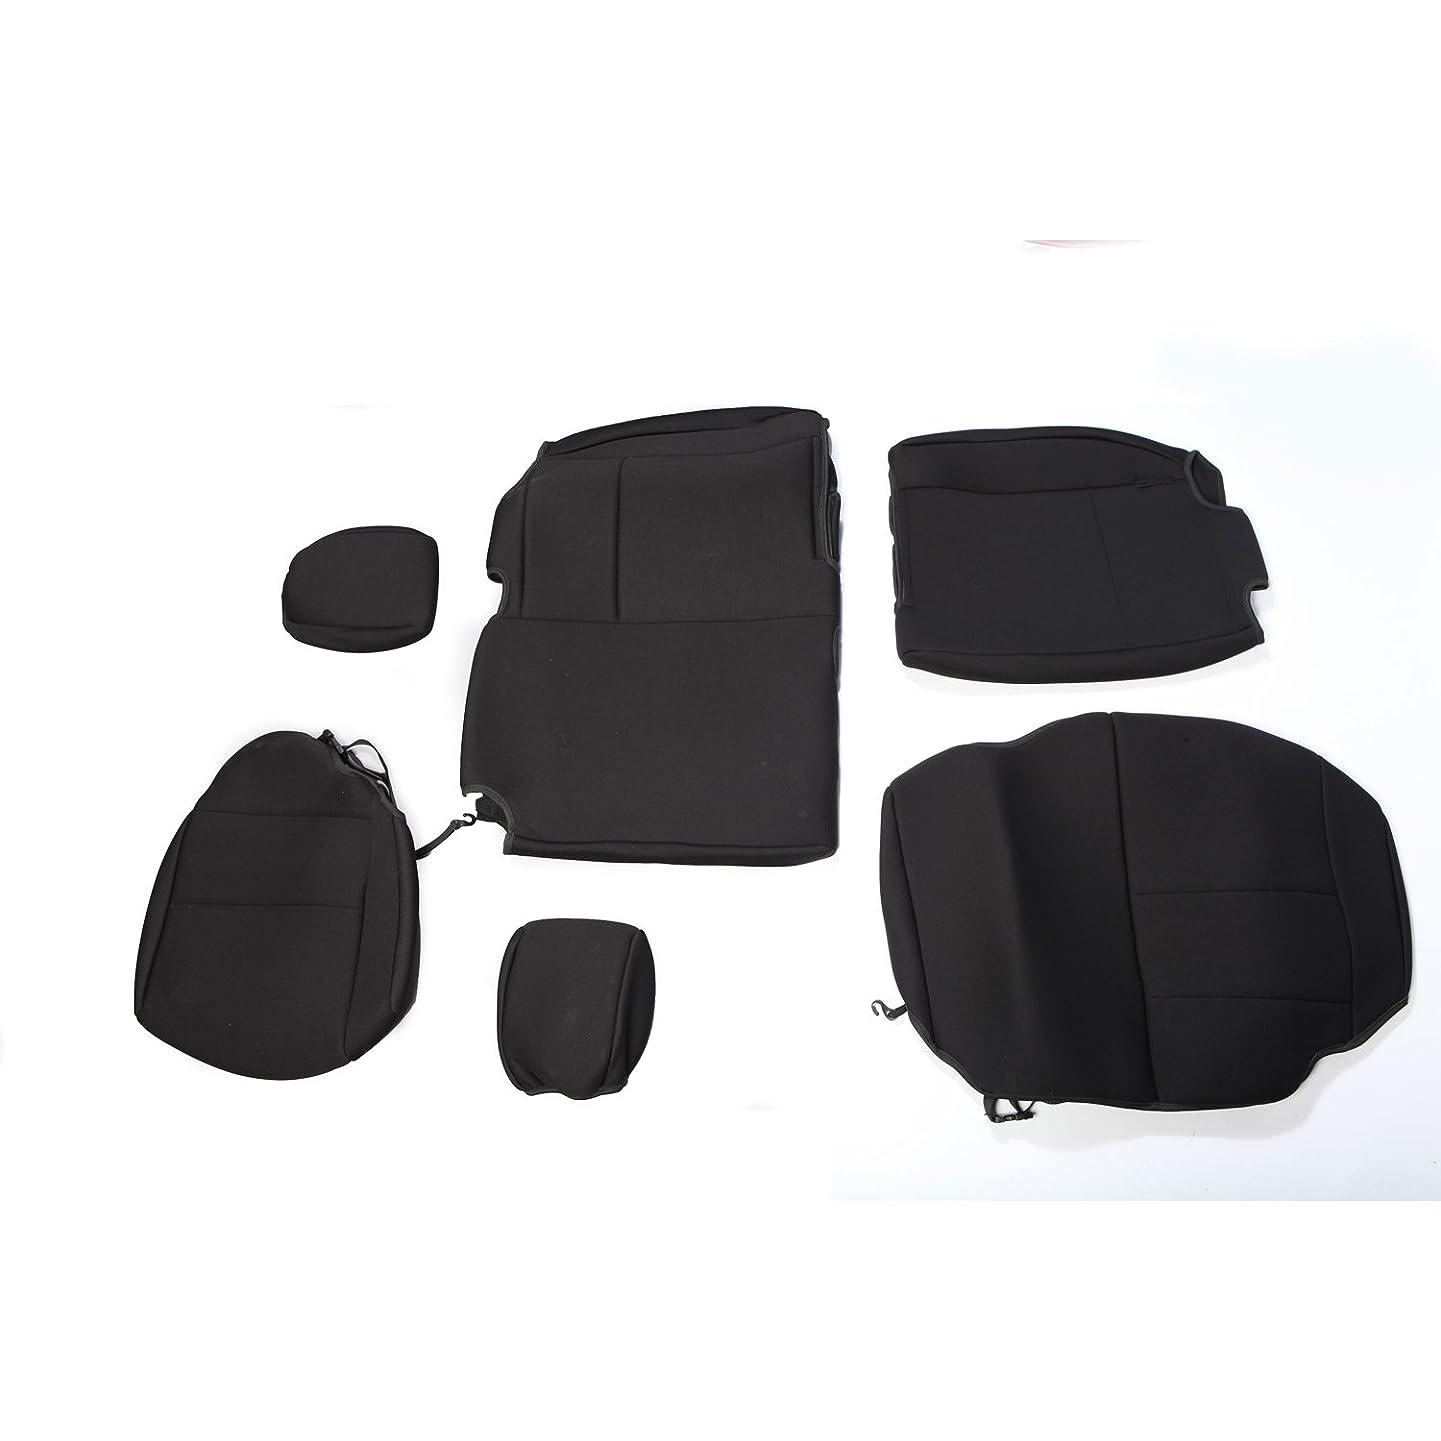 Rugged Ridge 13264.01 Black Custom Neoprene Rear Seat Cover